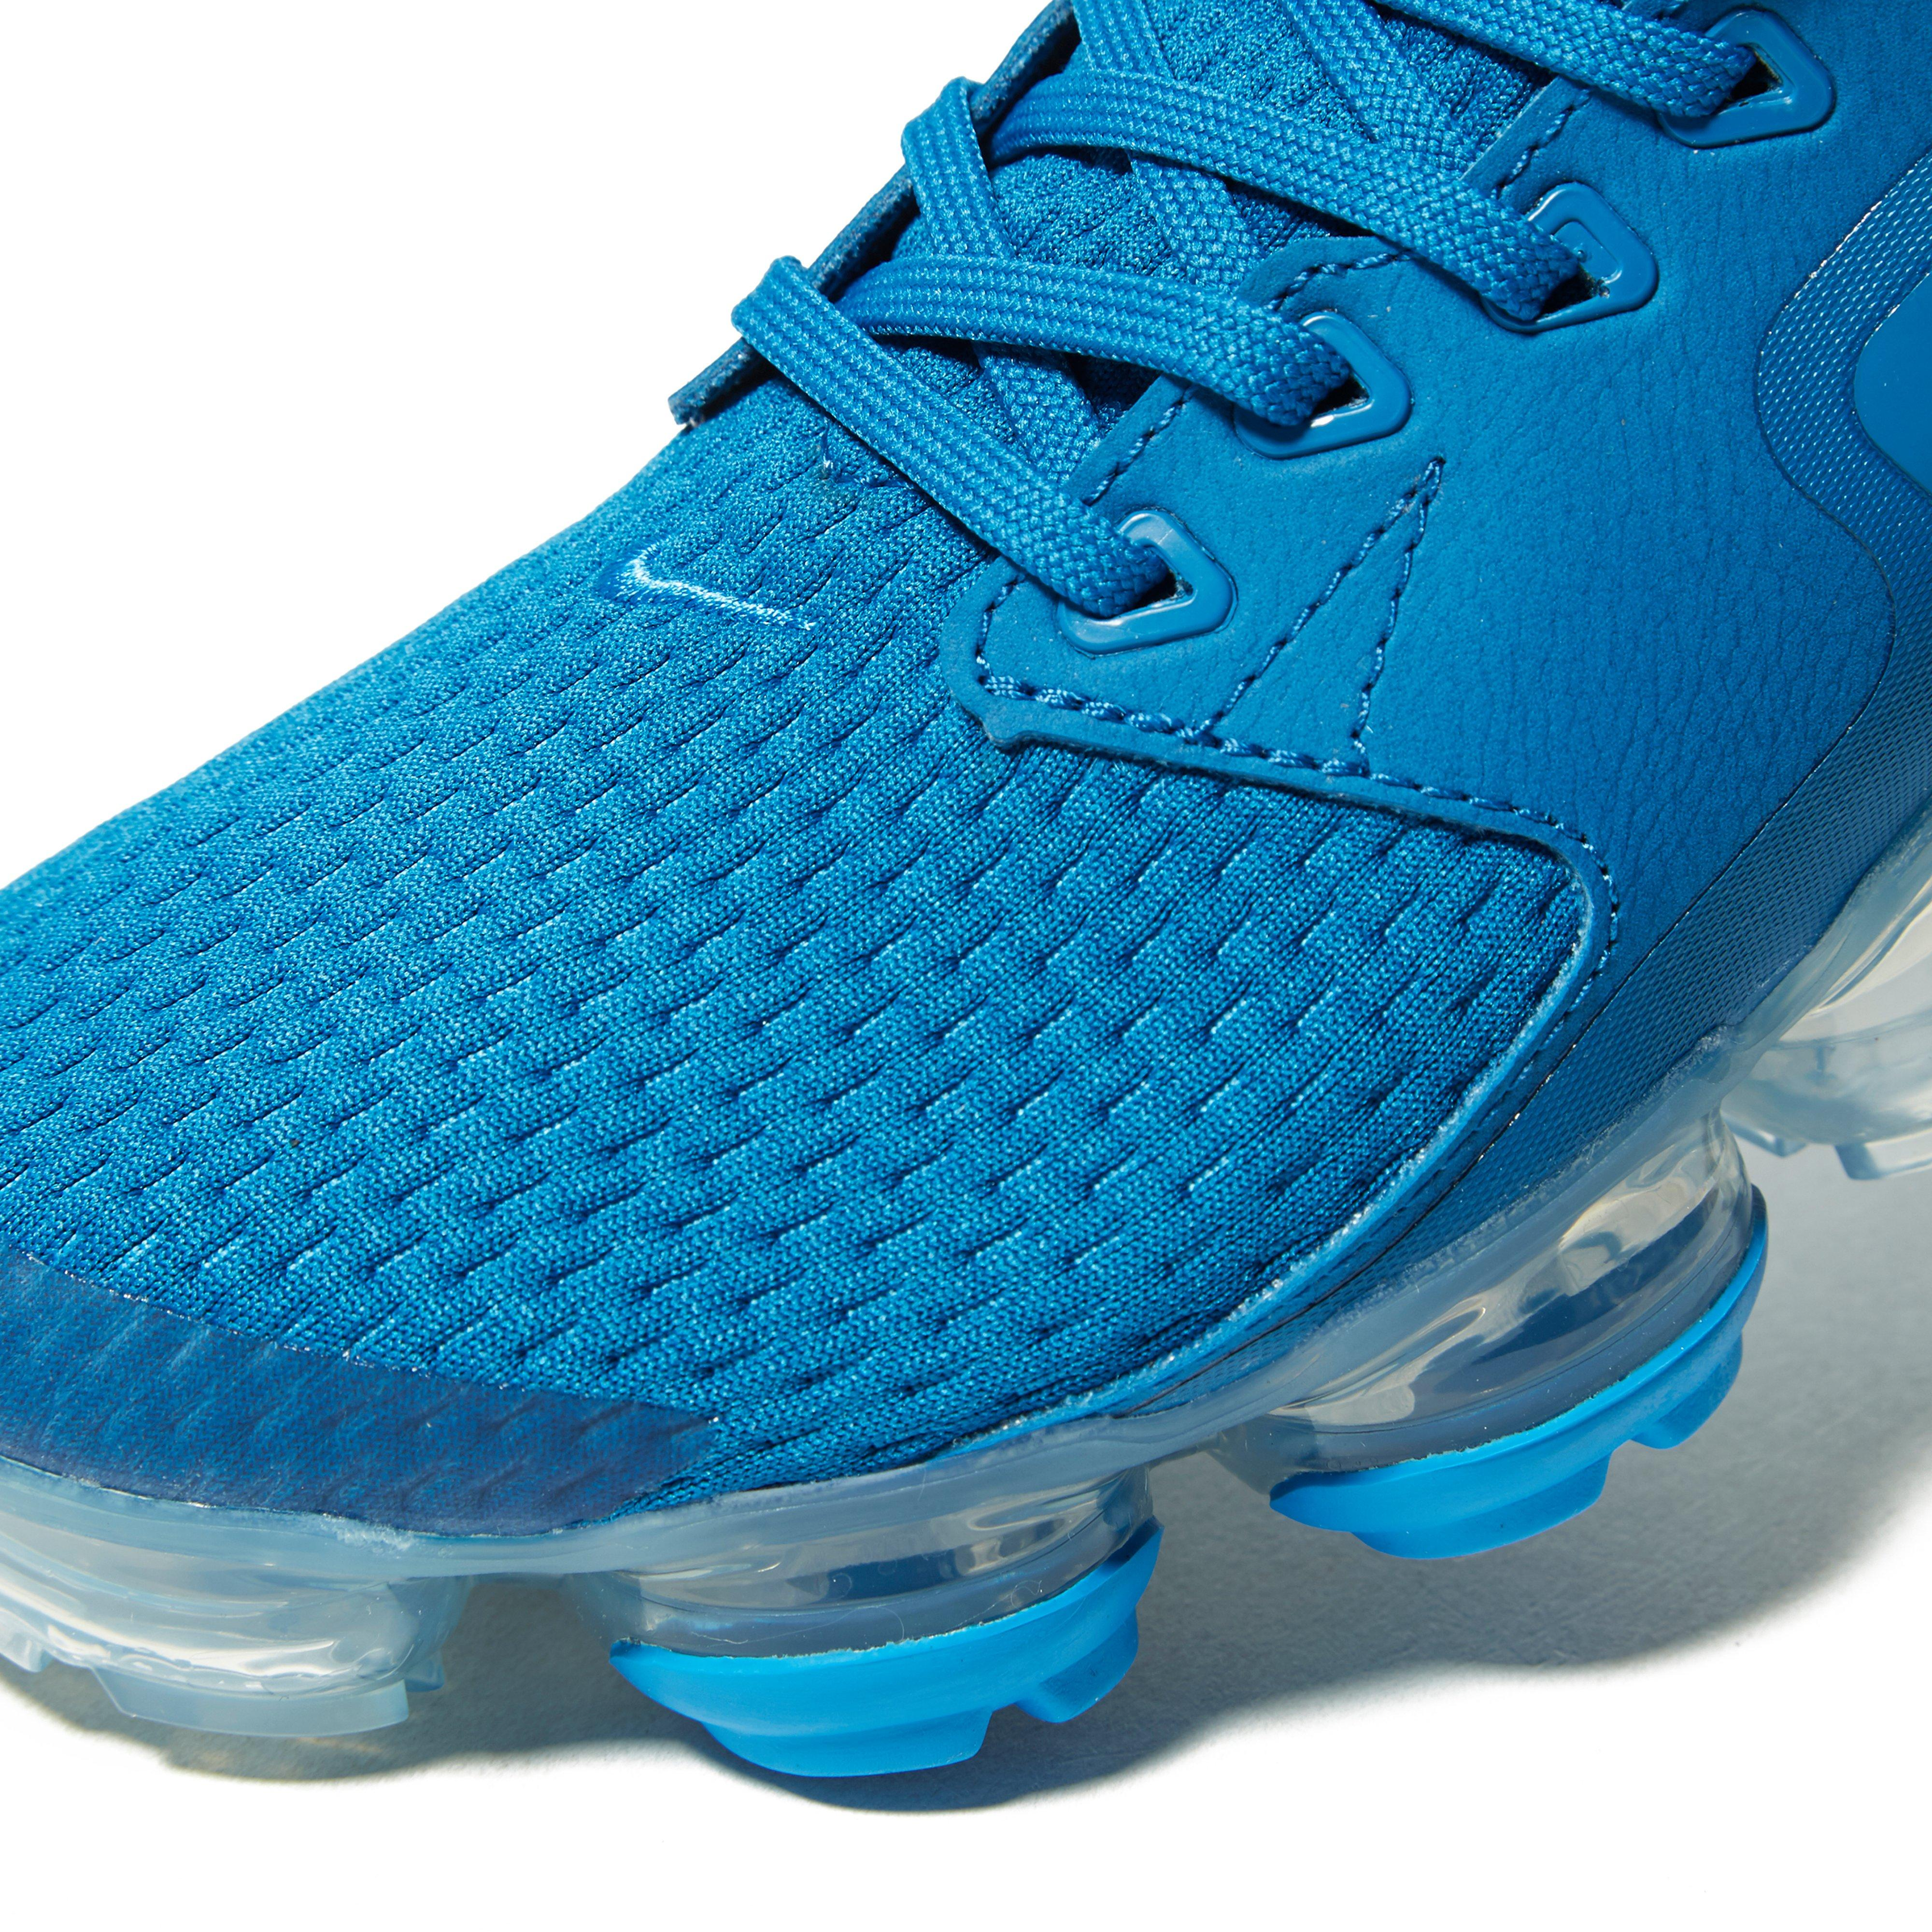 949f6e98c84 Nike Mercurial Vapor Turf Boys Kd 7